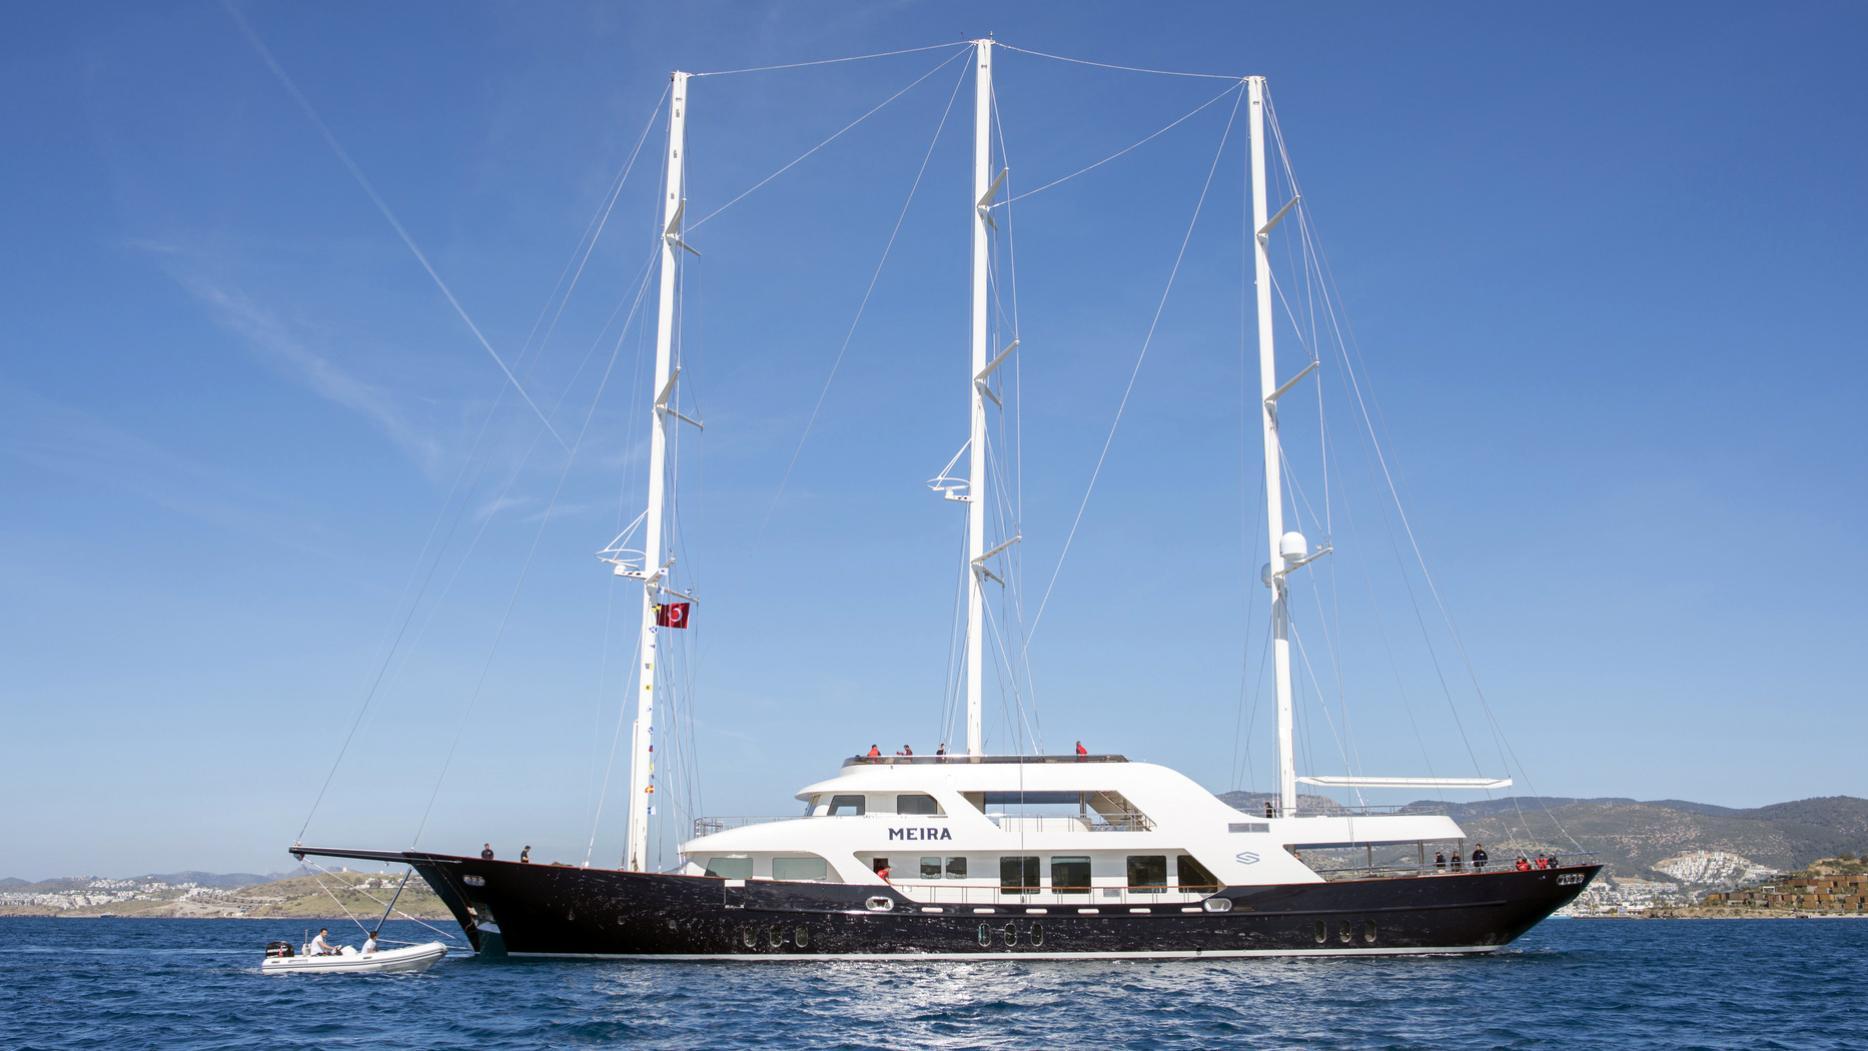 meira motorsailer yacht neta marine 55m 2018 launch profile